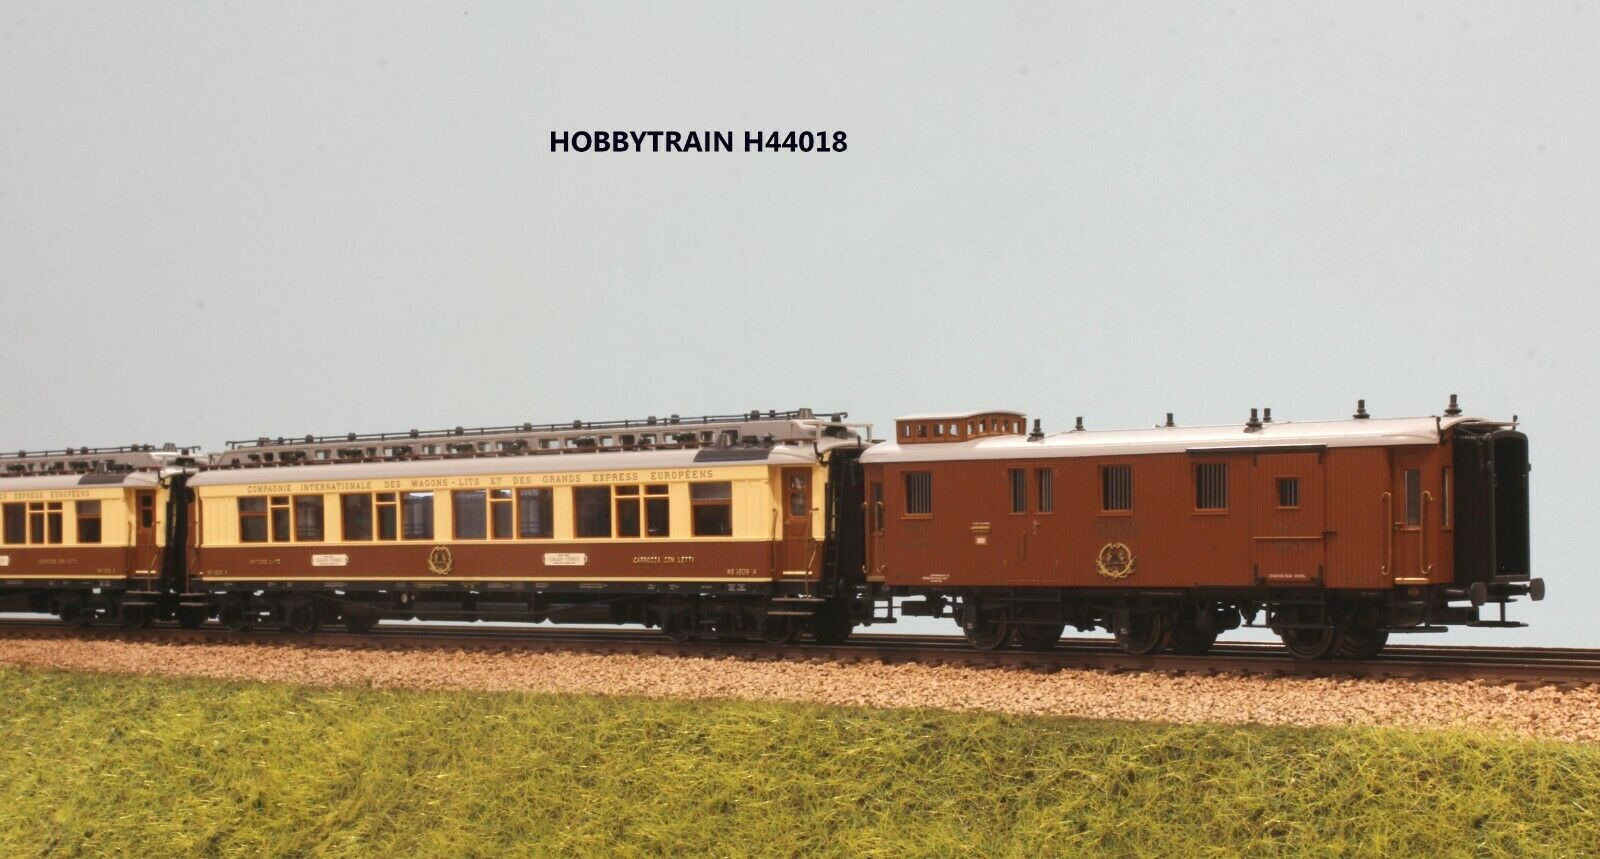 HOBBYTRAIN H 44018 SET 3 CocheROZZE CIWL  SIMPLON EXPRESS CALAIS VENEZIA EP. I